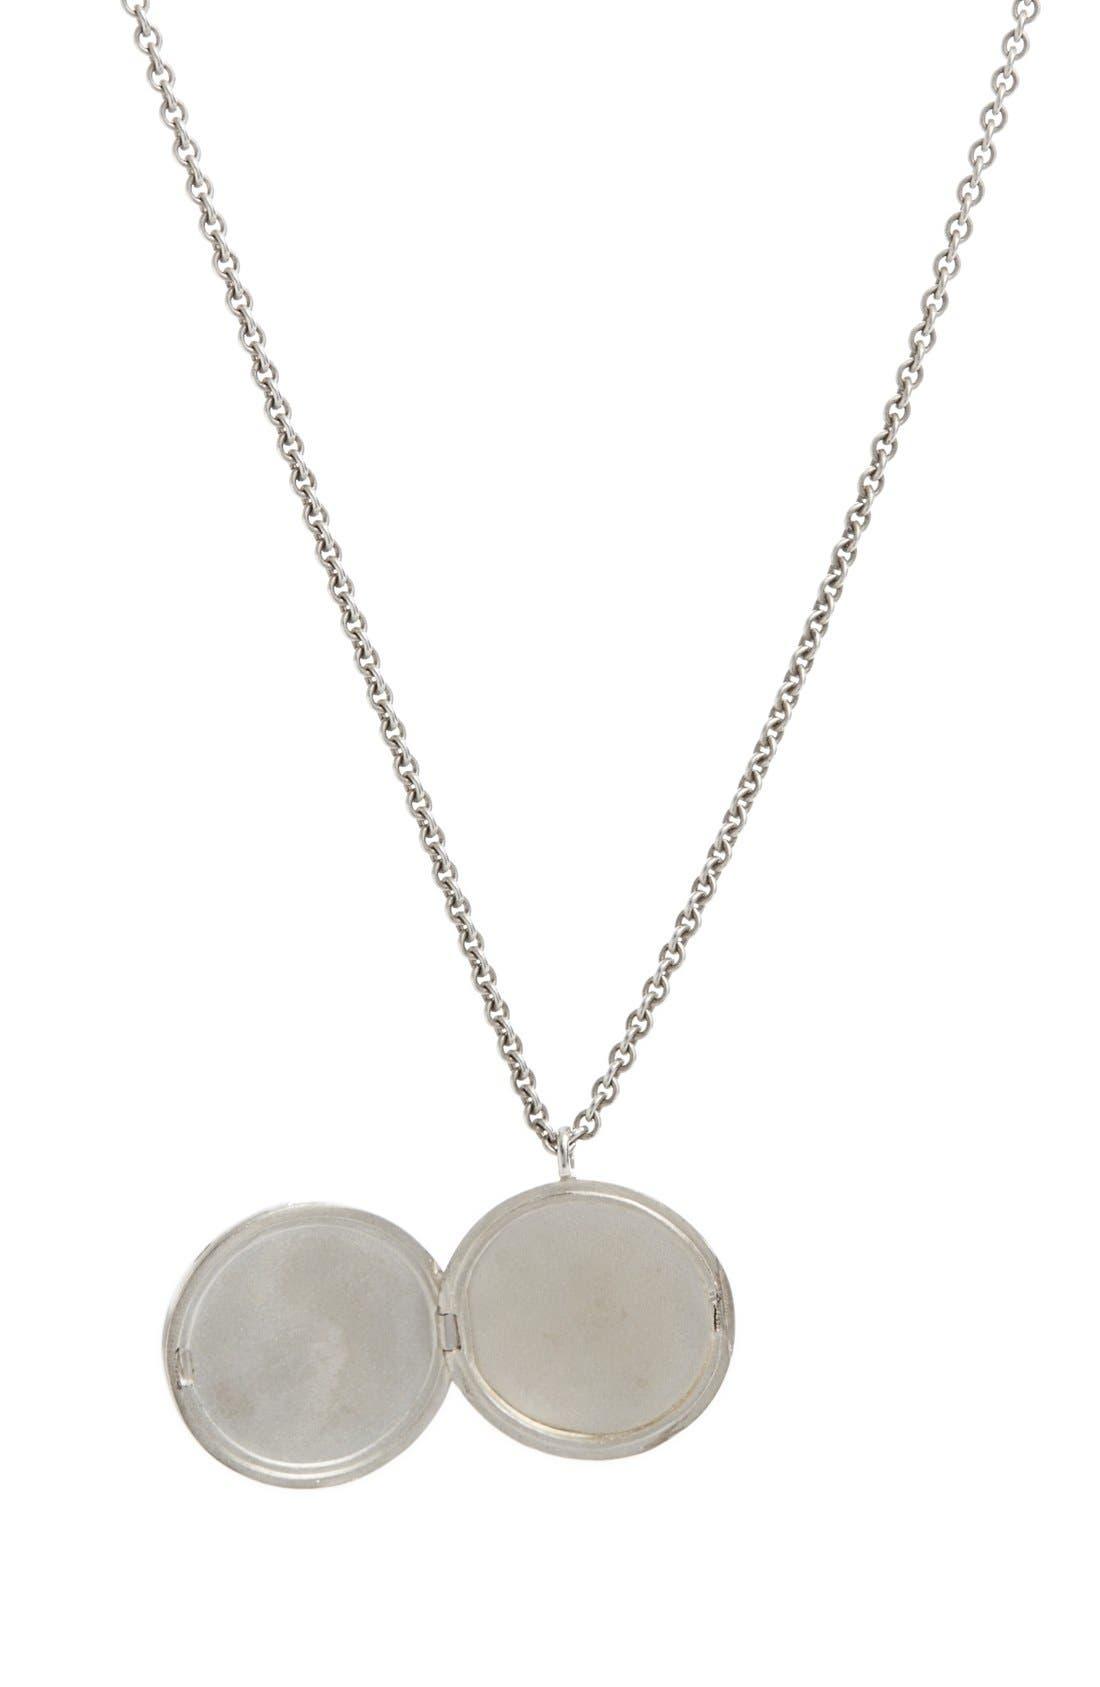 Black Onyx Medallion Necklace,                             Alternate thumbnail 2, color,                             SILVER